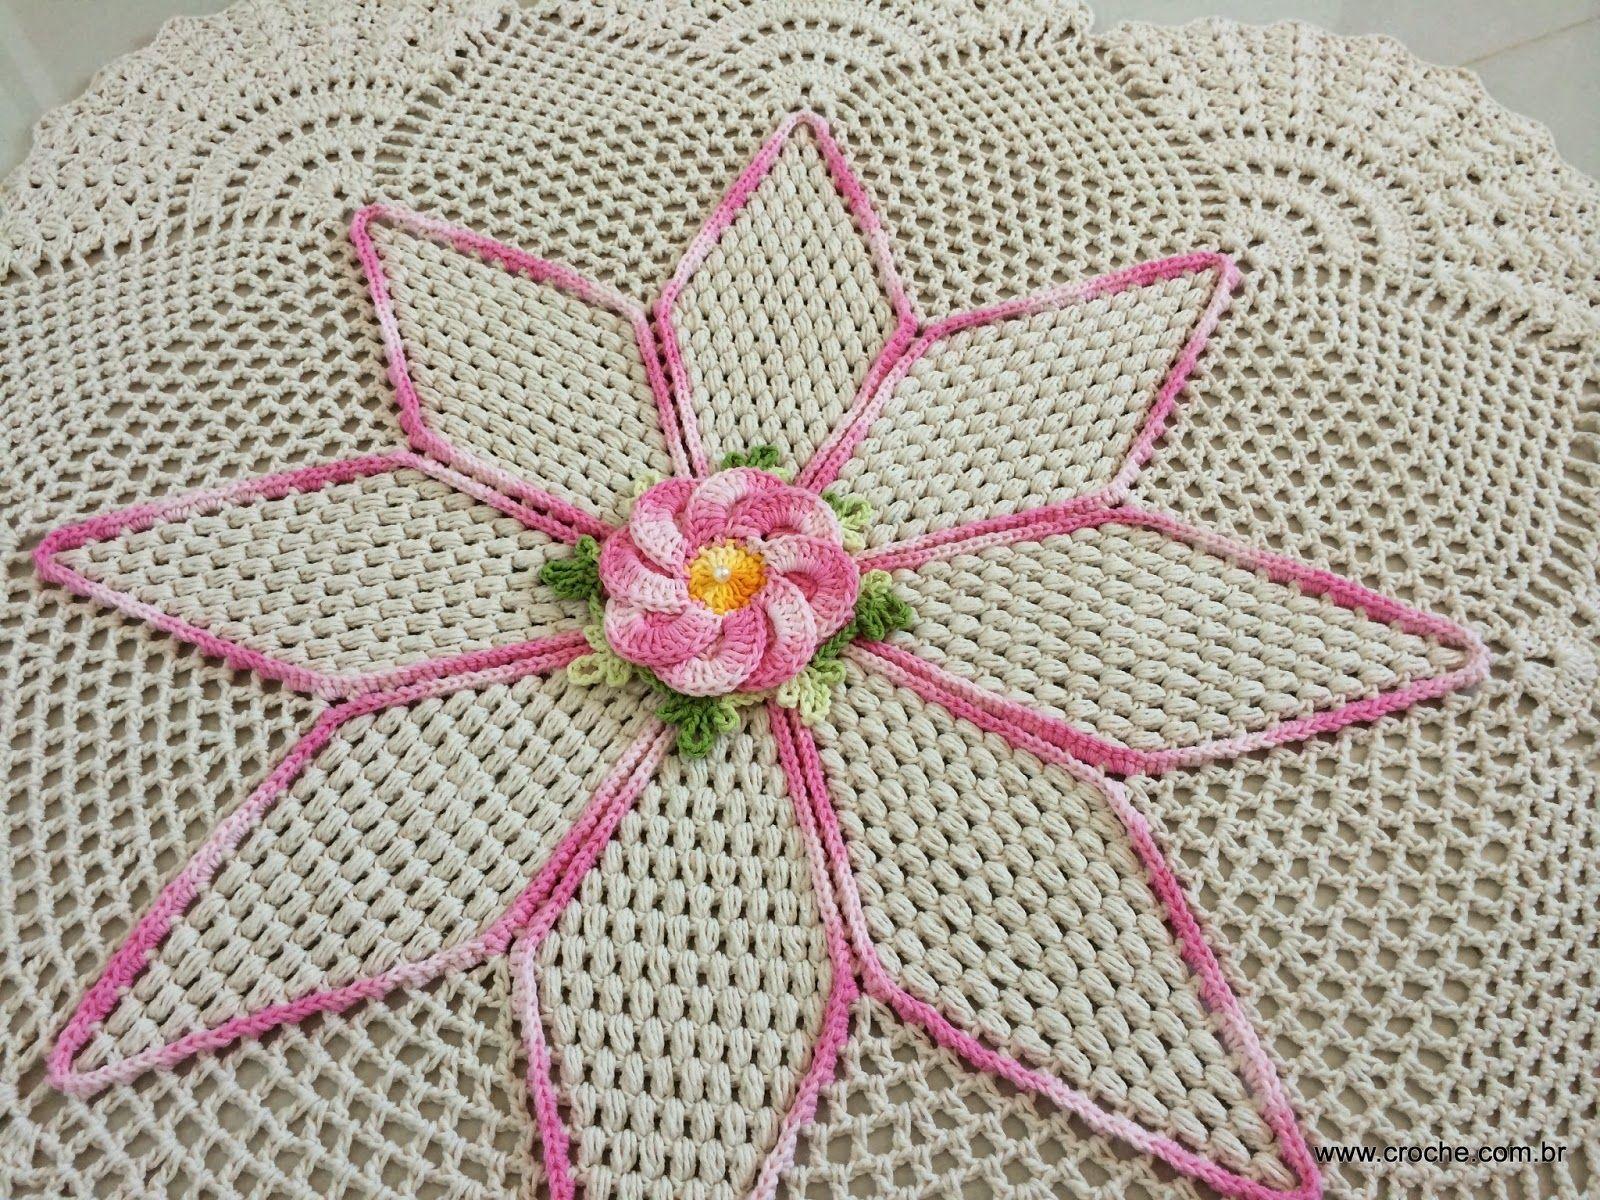 Tapete Redondo Flor Bergamota Croche Com Br Tapetes Lindos E  -> Tapete De Croche Redondo Passo A Passo